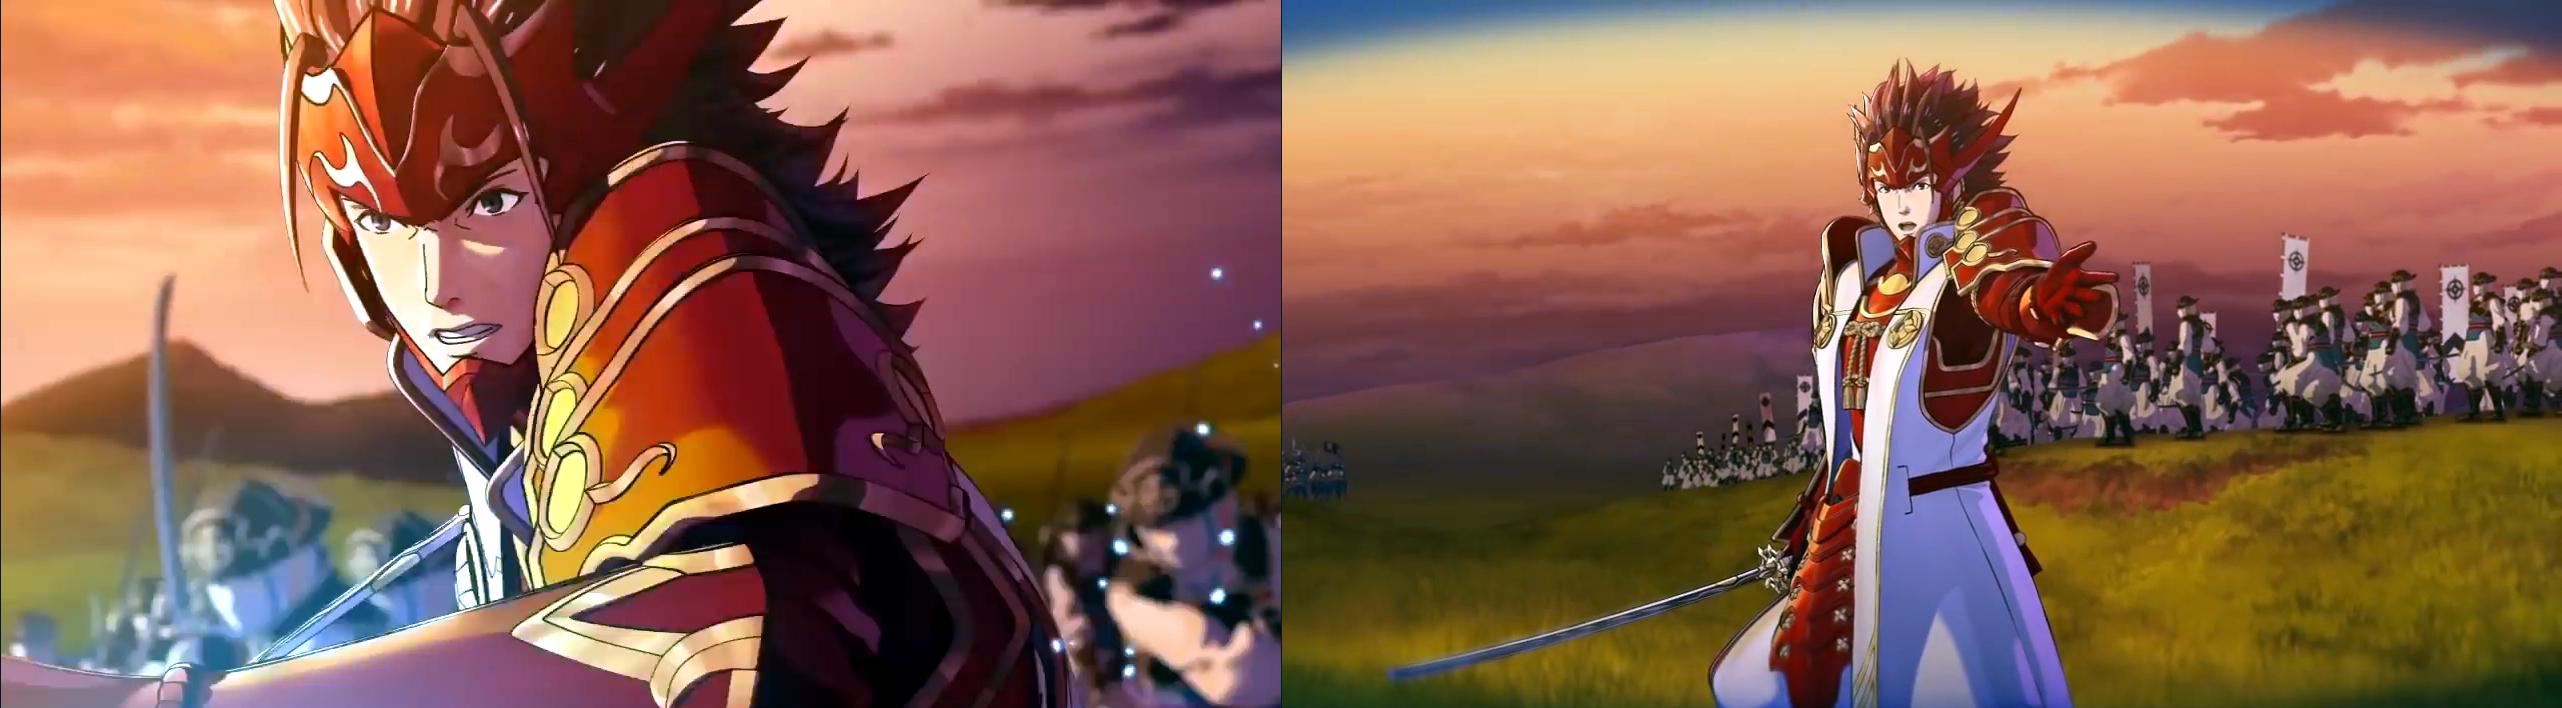 Ryouma, the Avatar's elder brother.